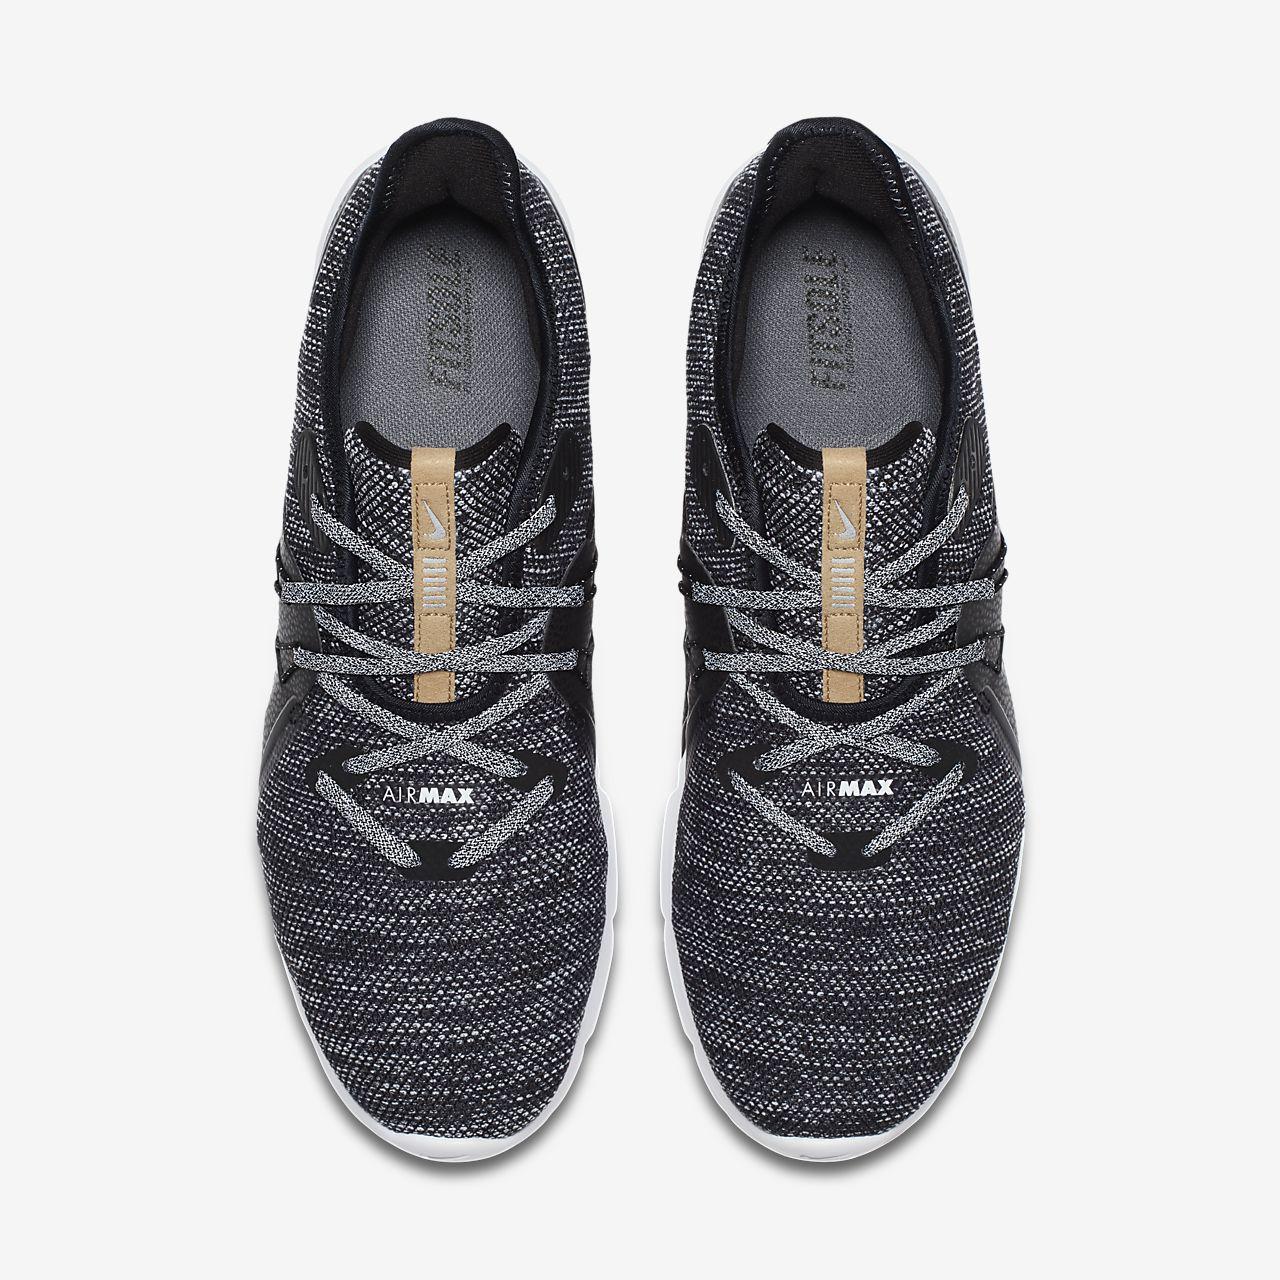 scarpa da running nike air max sequent 3 nerodark grey